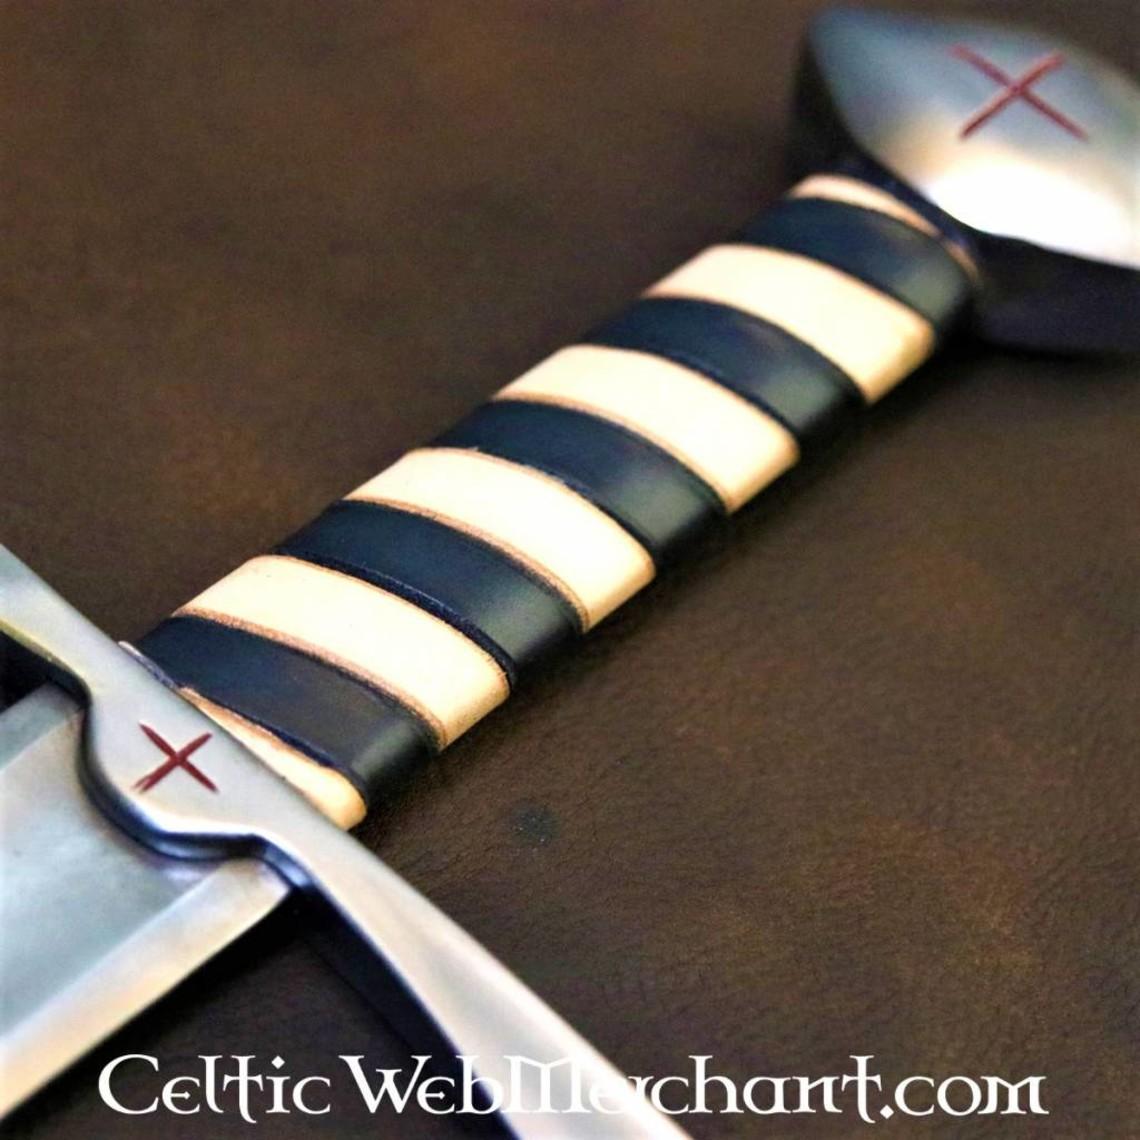 Spada crociato del XII secolo